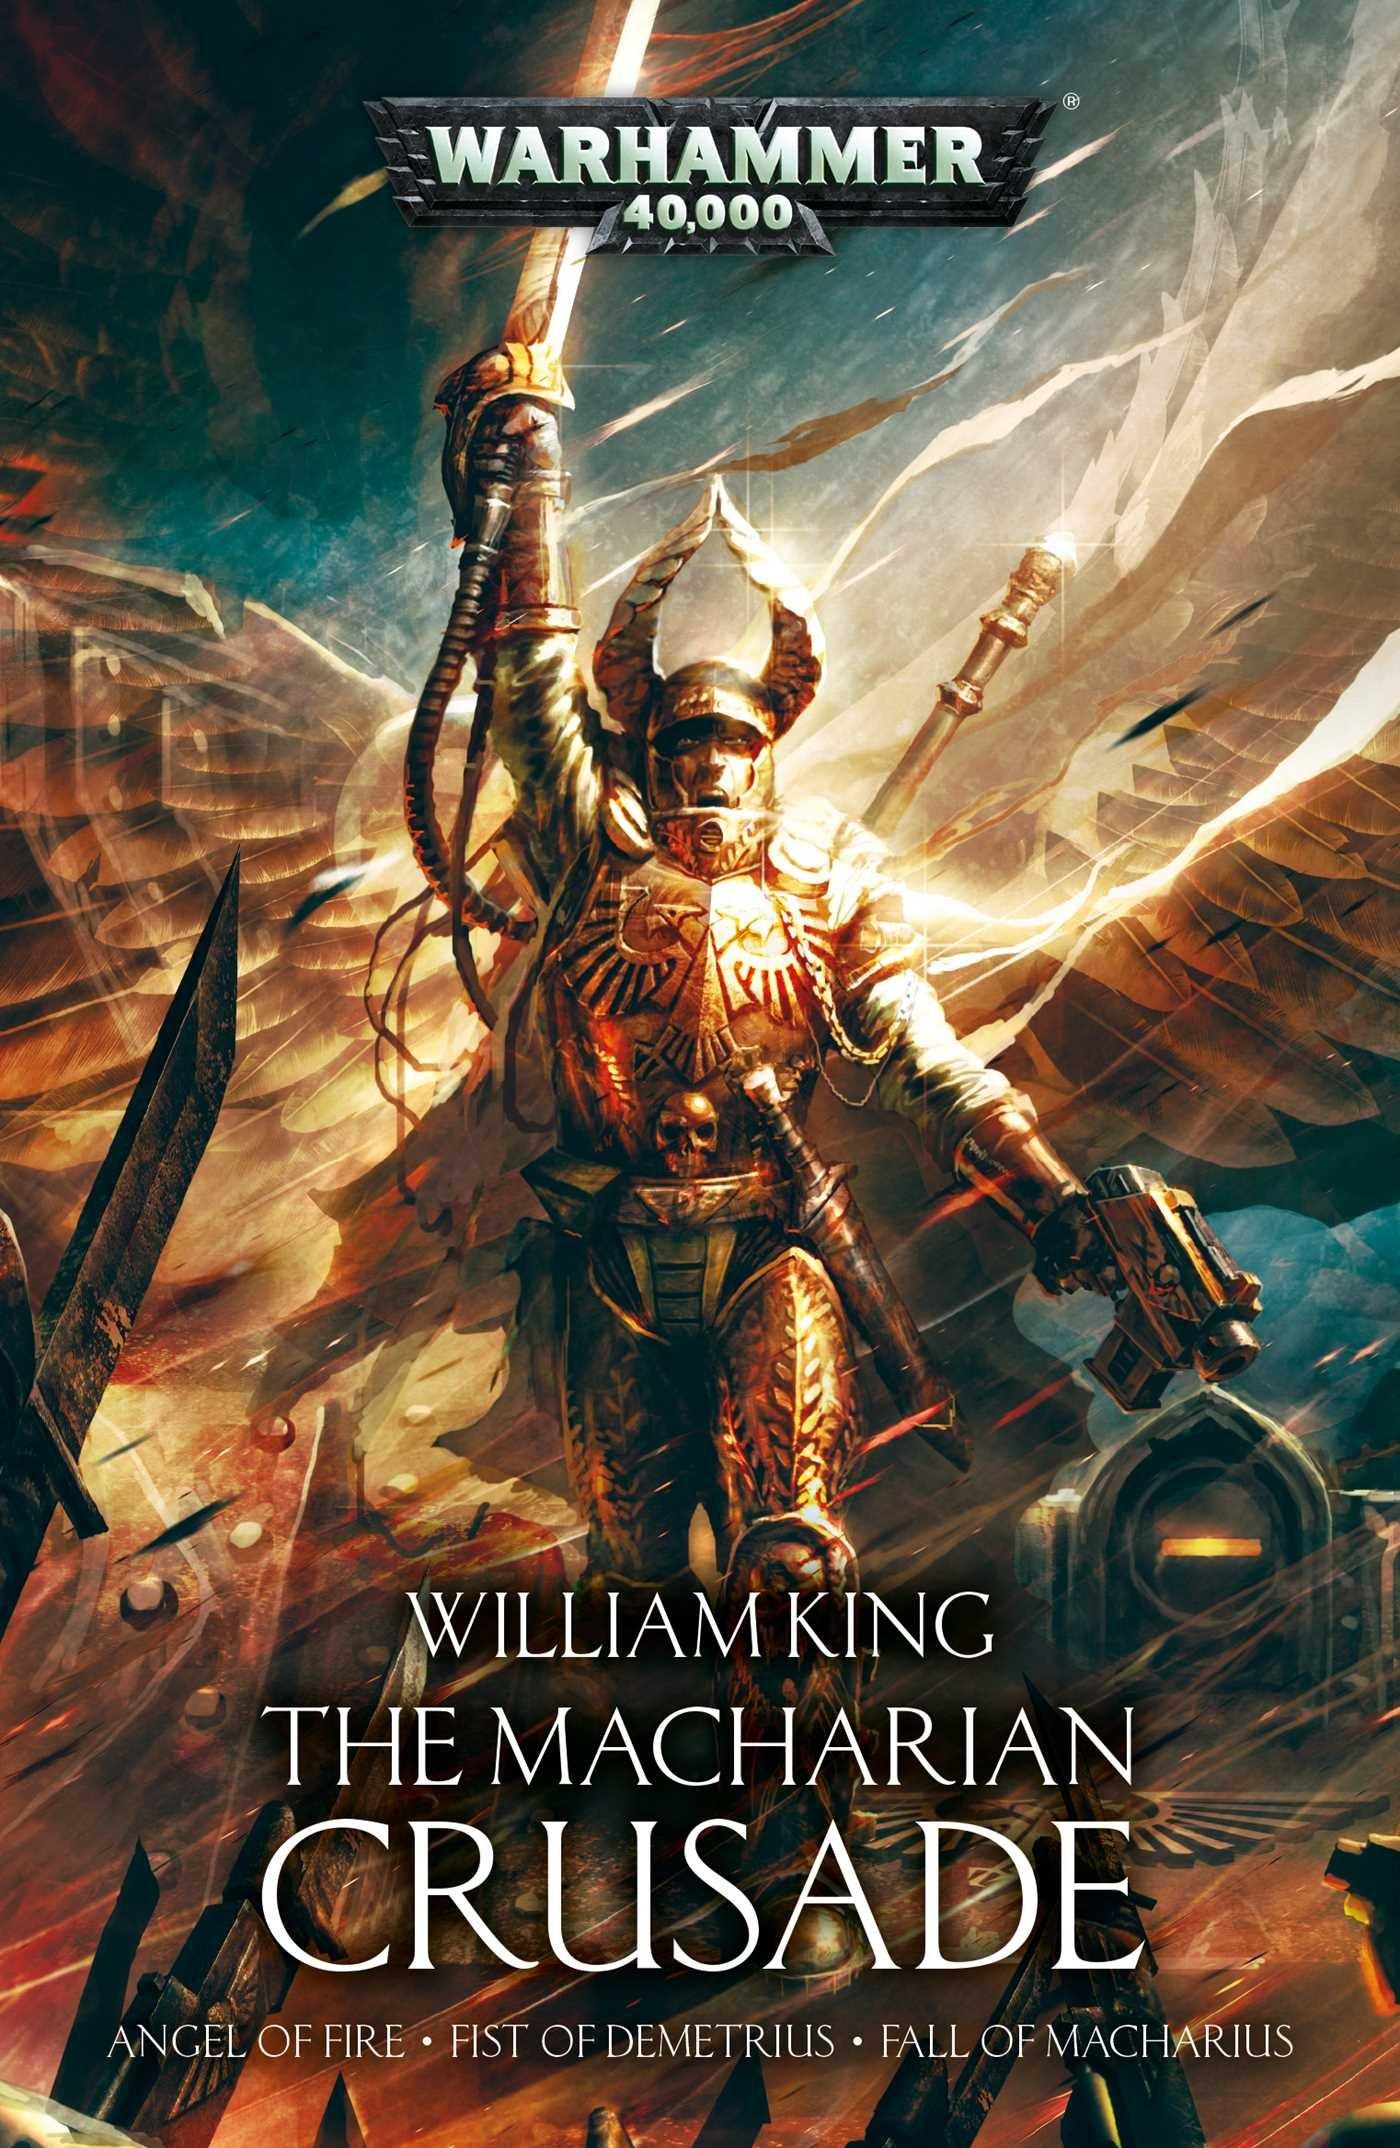 The macharian crusade omnibus william king 9781784964931 amazon the macharian crusade omnibus william king 9781784964931 amazon books fandeluxe Gallery